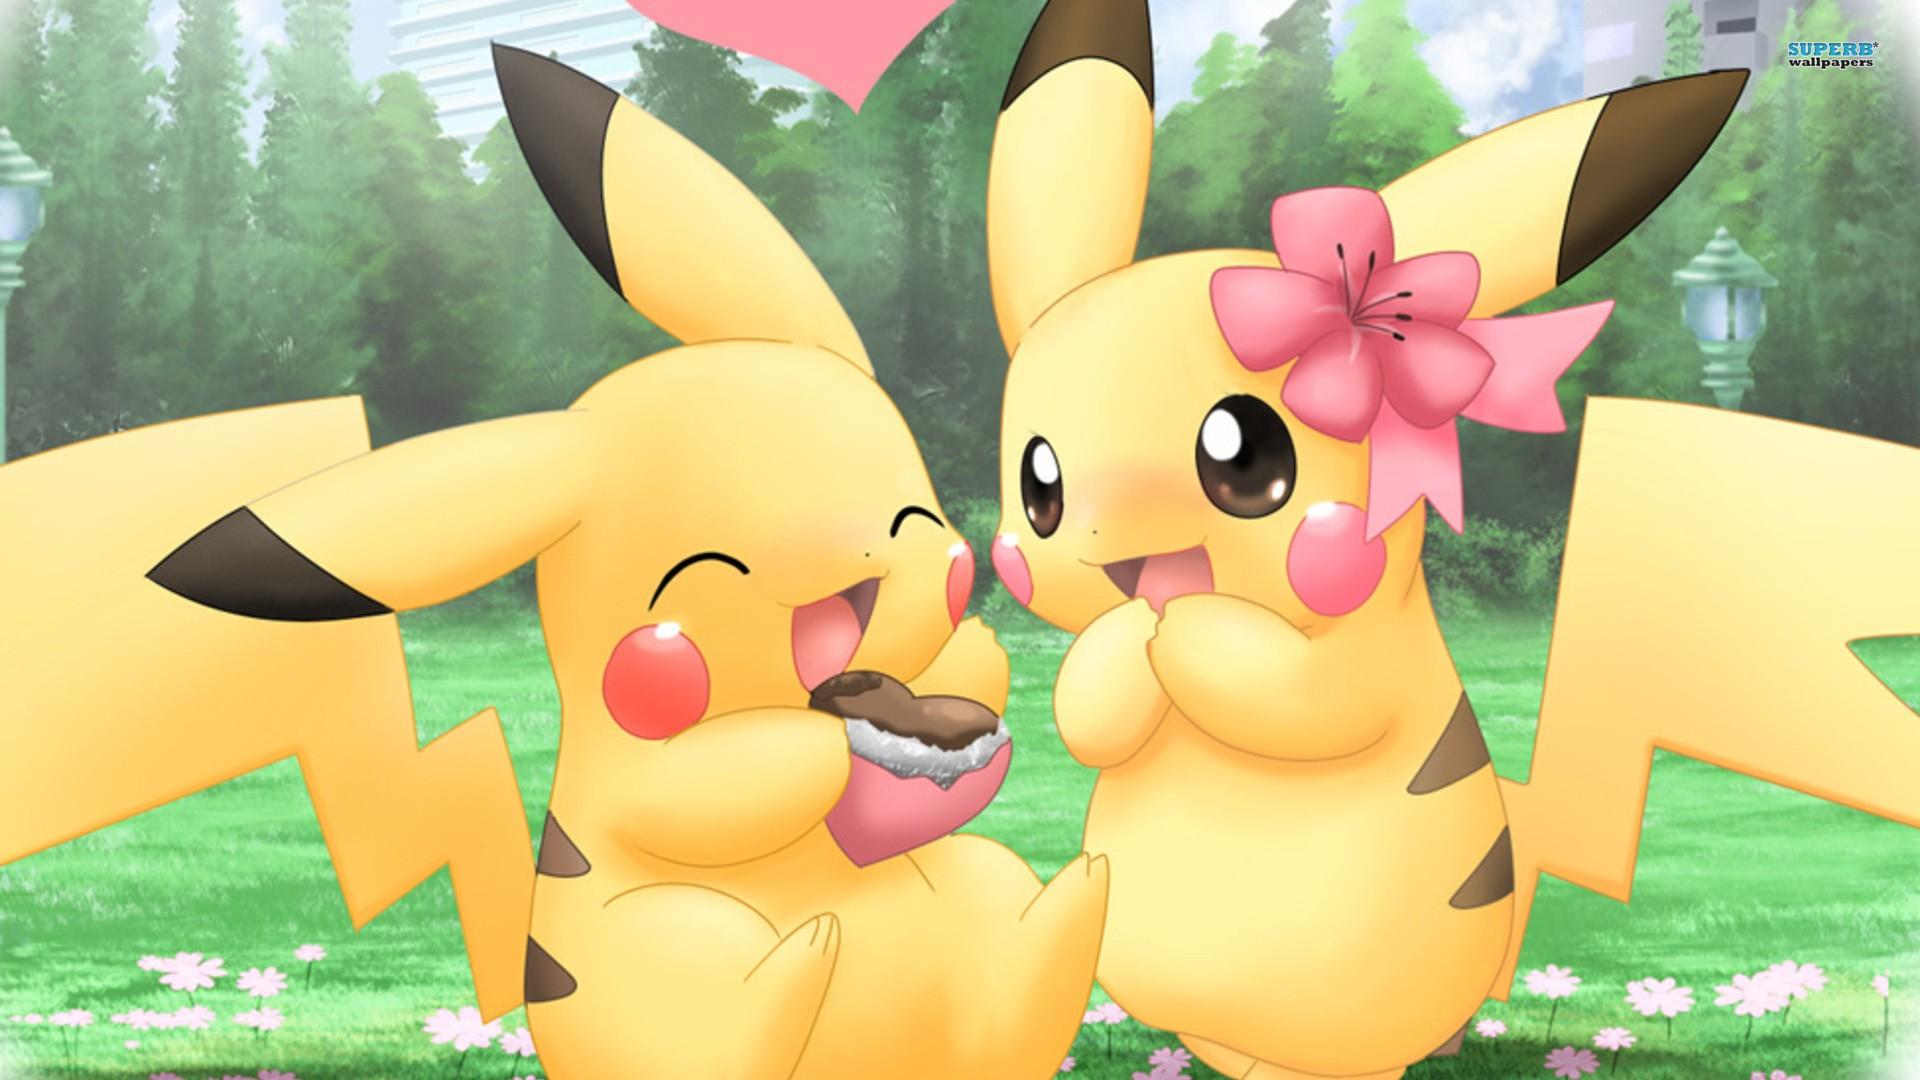 In summer hd wallpaper download cartoon wallpaper html code - Pikachu Pokemon Cute Couples Hd Wallpaper Of Cartoon Hdwallpaper2013